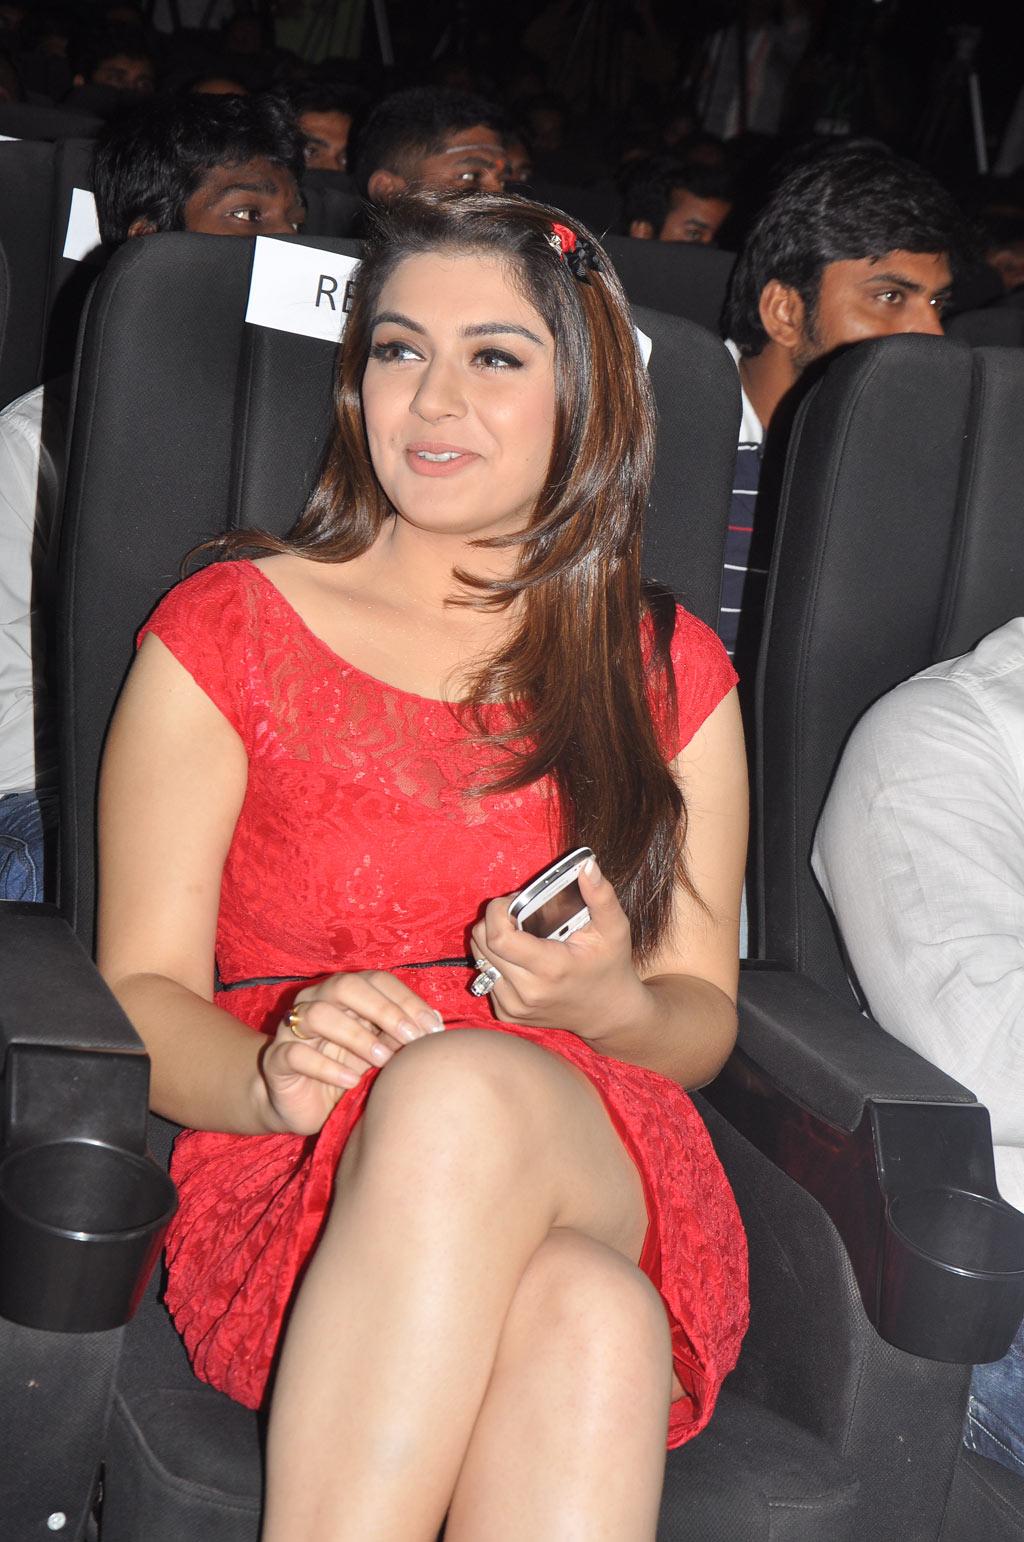 Hansika Motwani Showing Her Cute Legs At Telugu Film 'Settai' Audio Launch